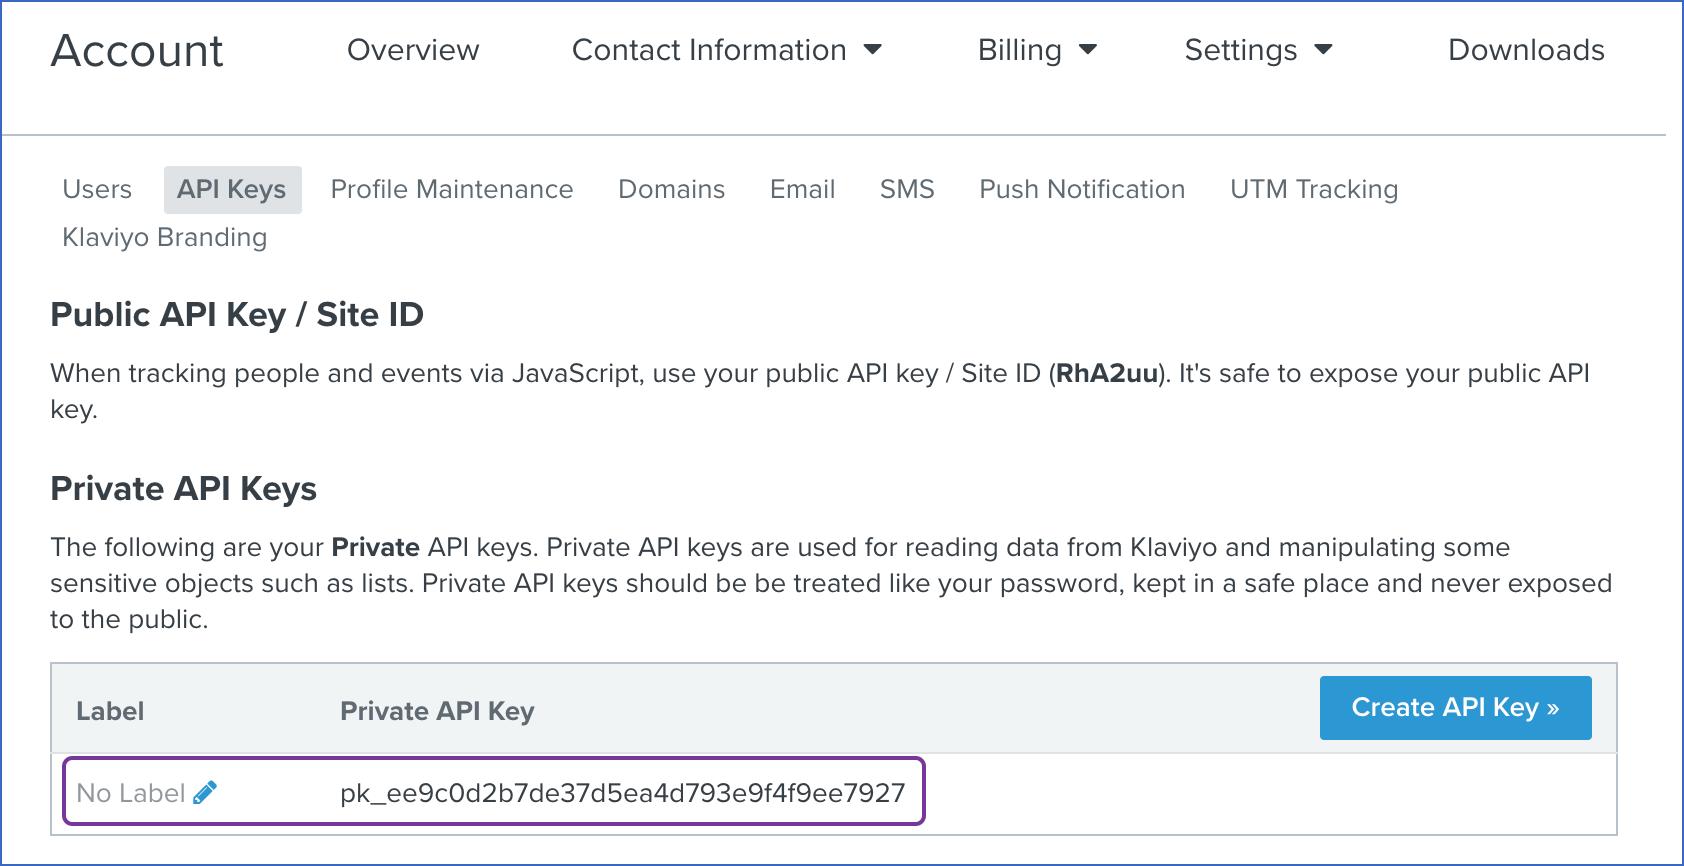 New API Key without Label